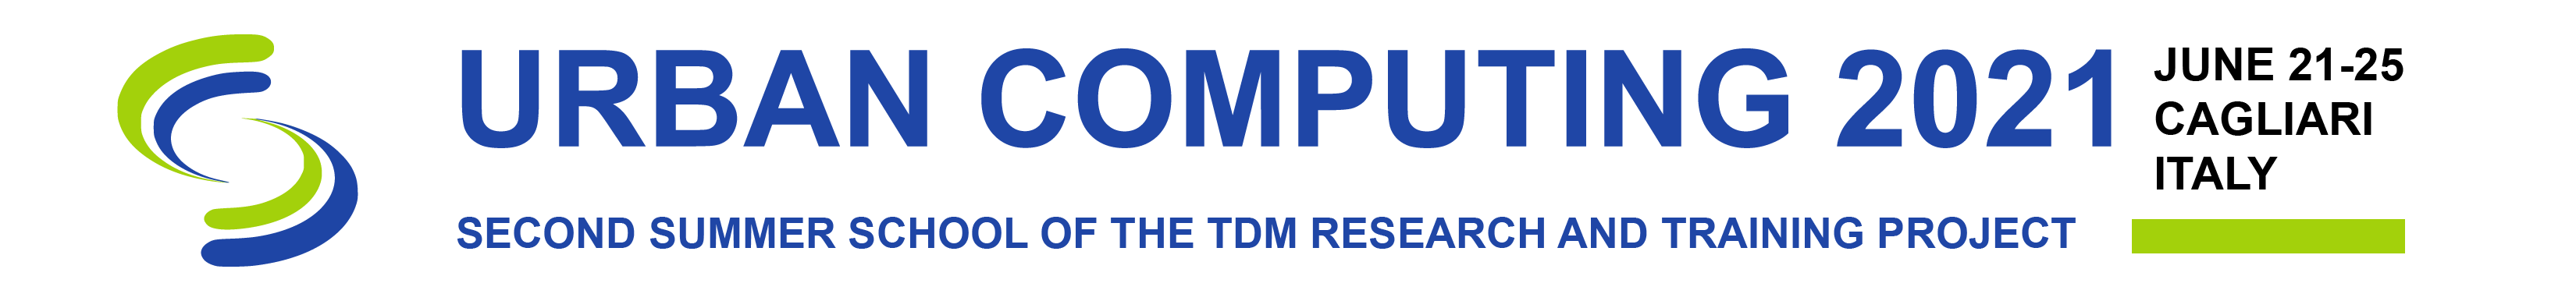 TDM Urban Computing 2021 Logo